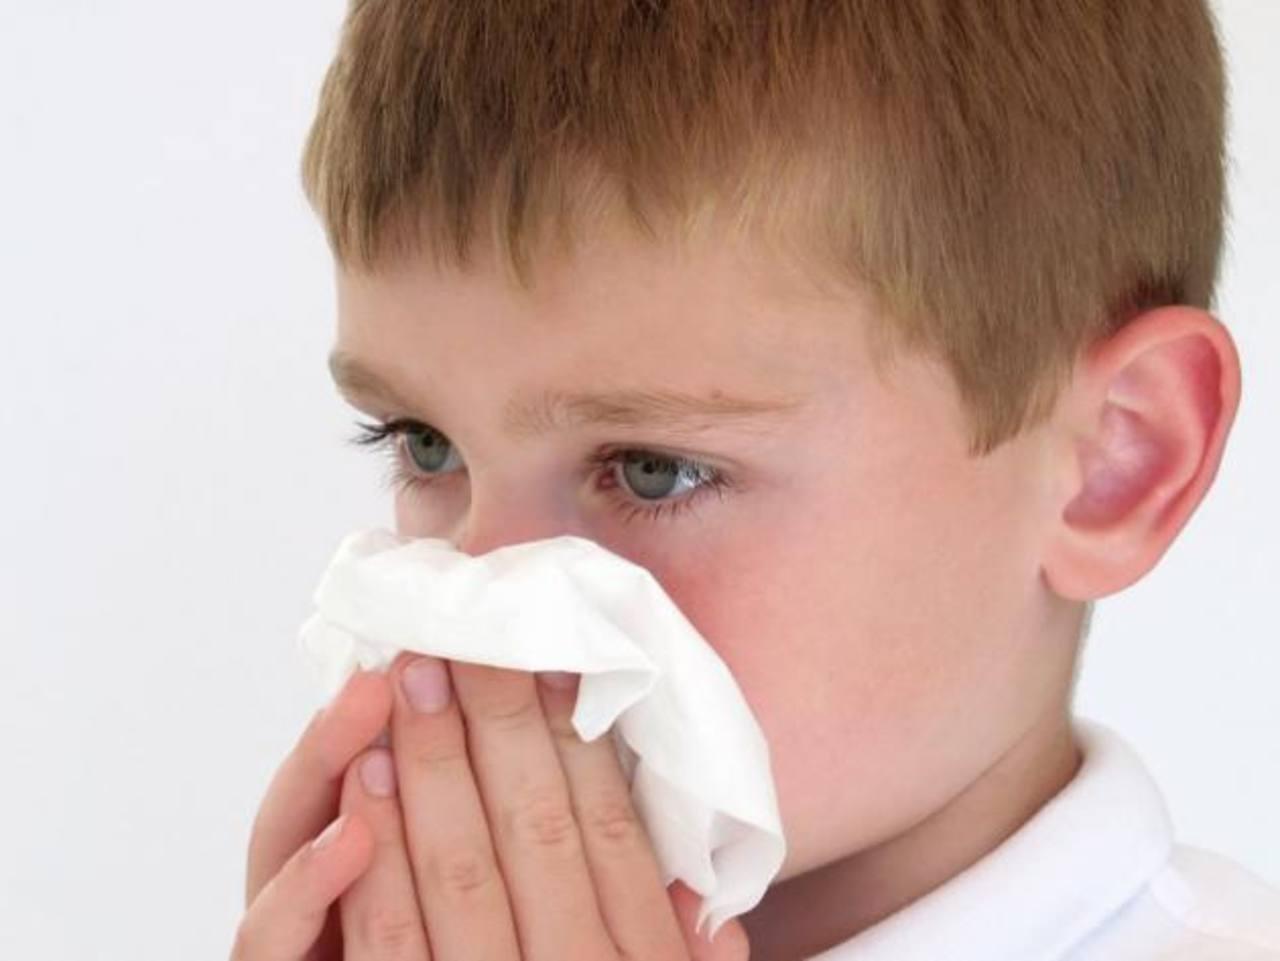 Los casos confirmados son niños con historial de asma o dificultades respiratorias.